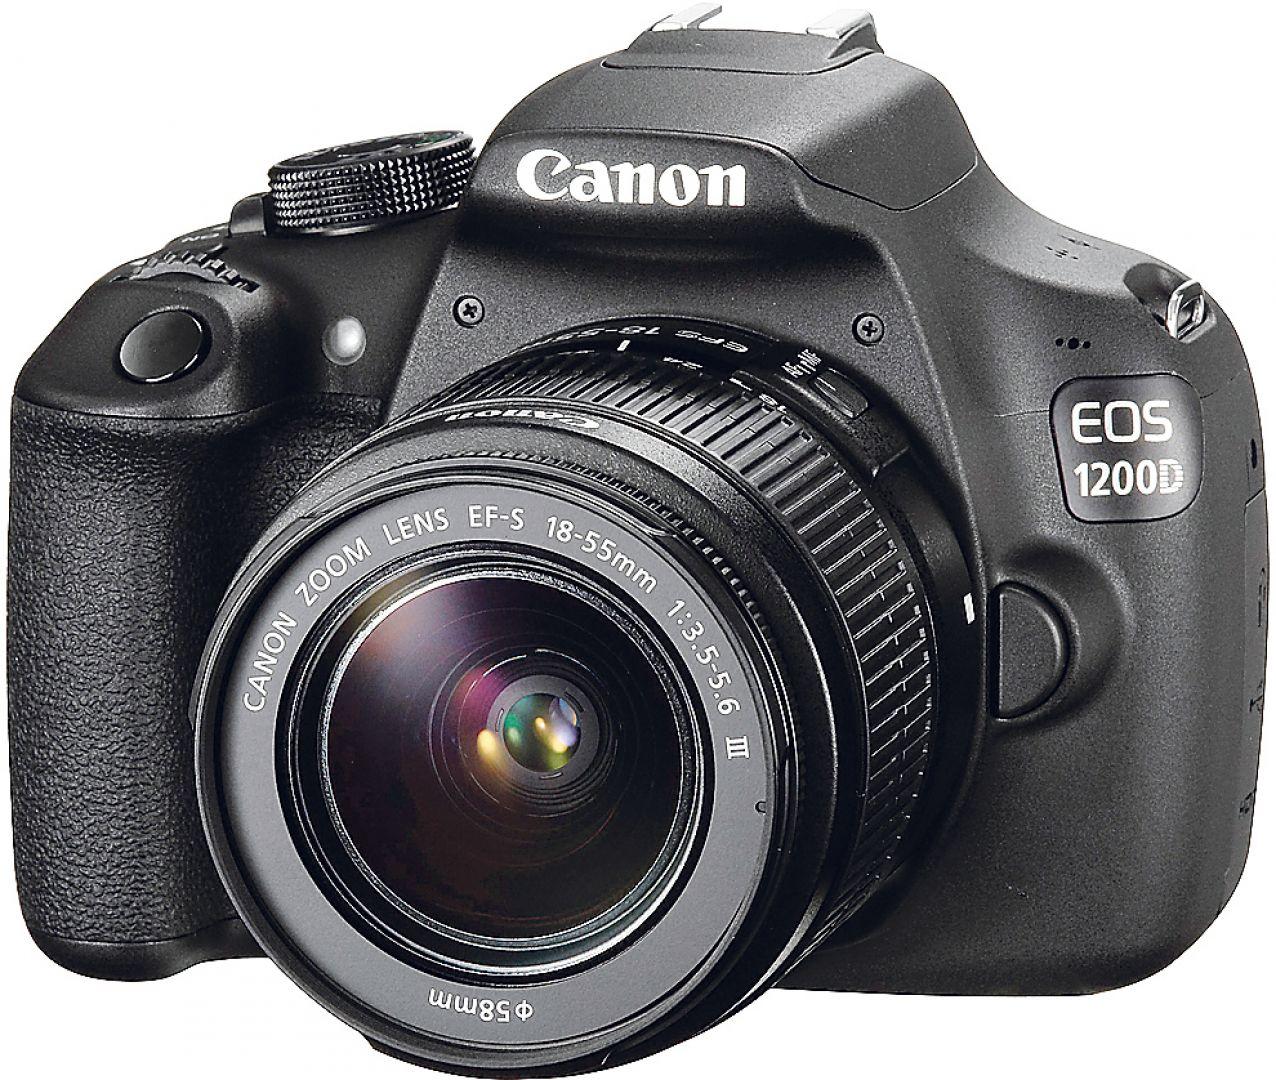 Canon 1200D - RRP $320 [CONSUMER DSLR]